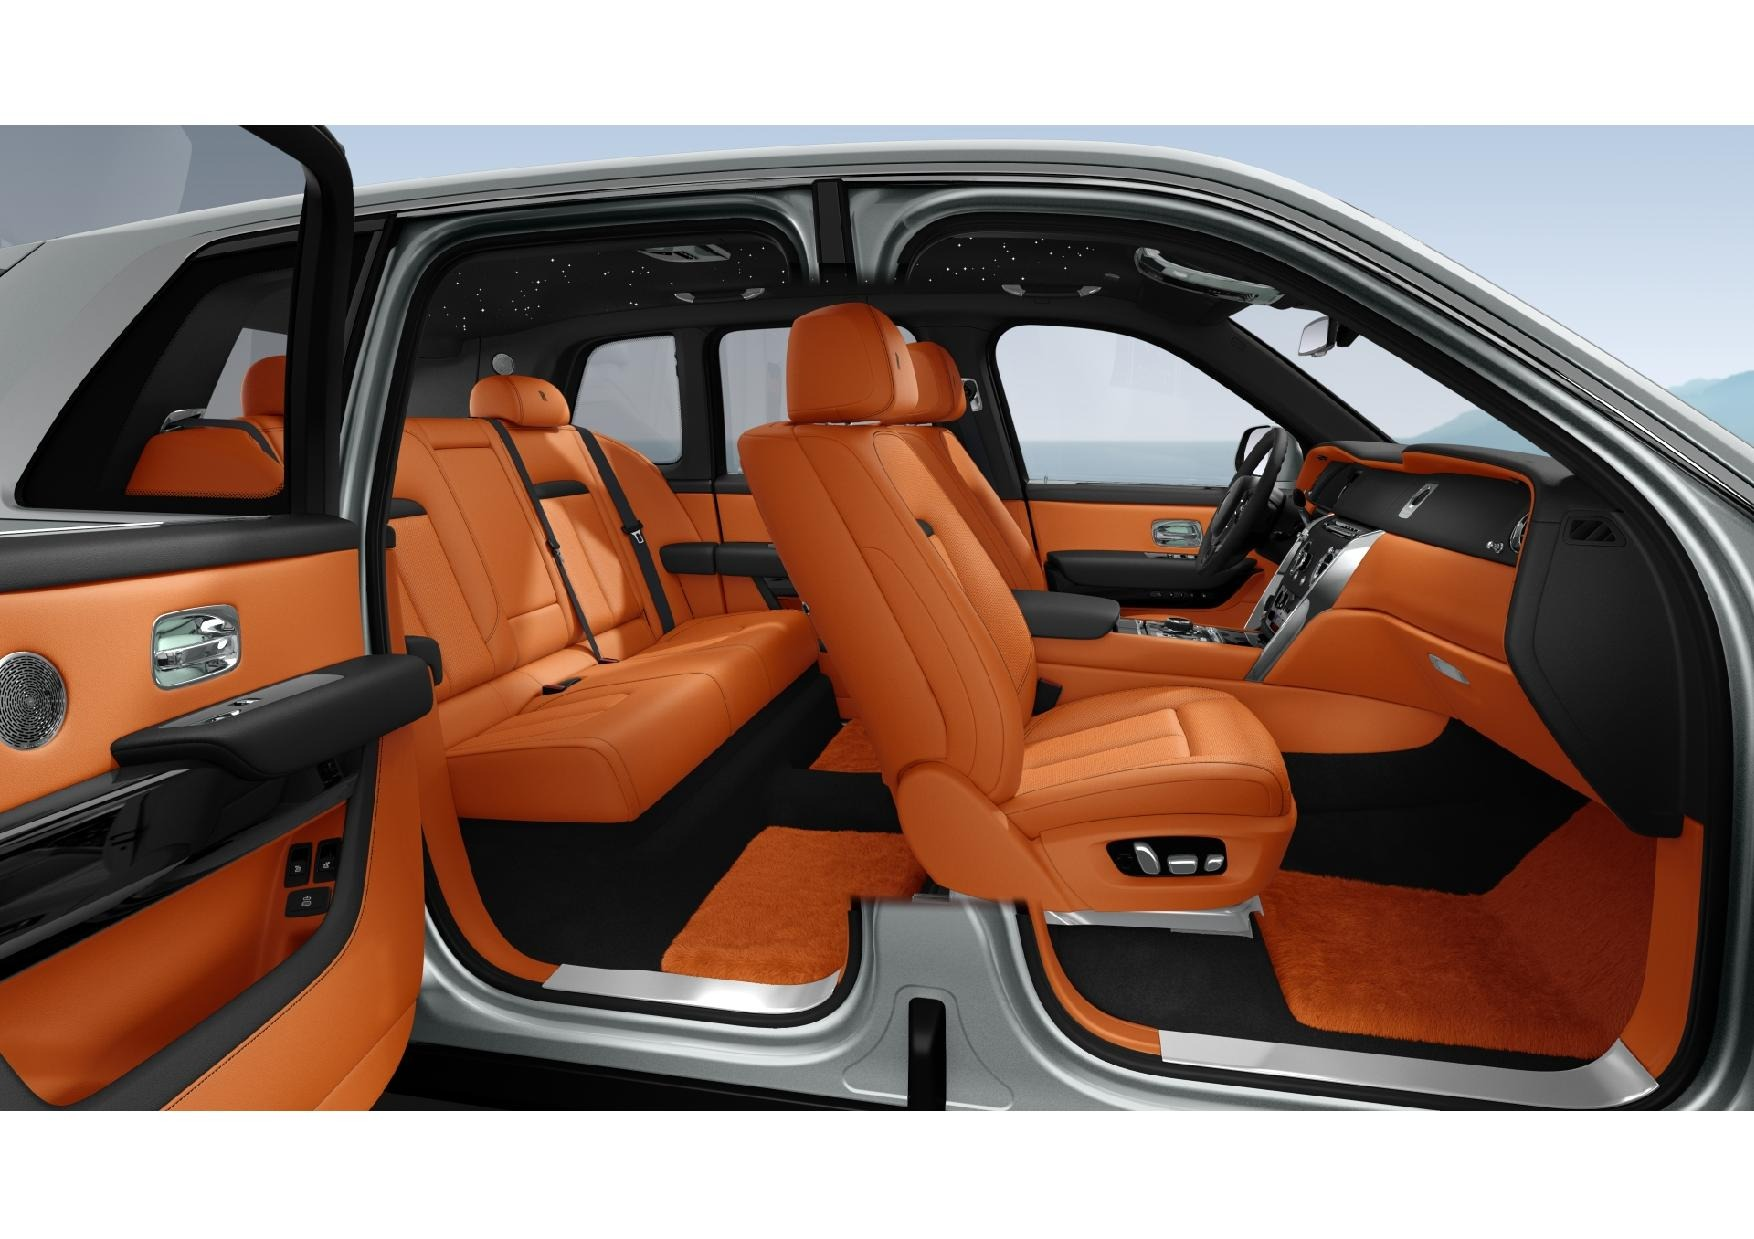 New 2022 Rolls Royce Cullinan